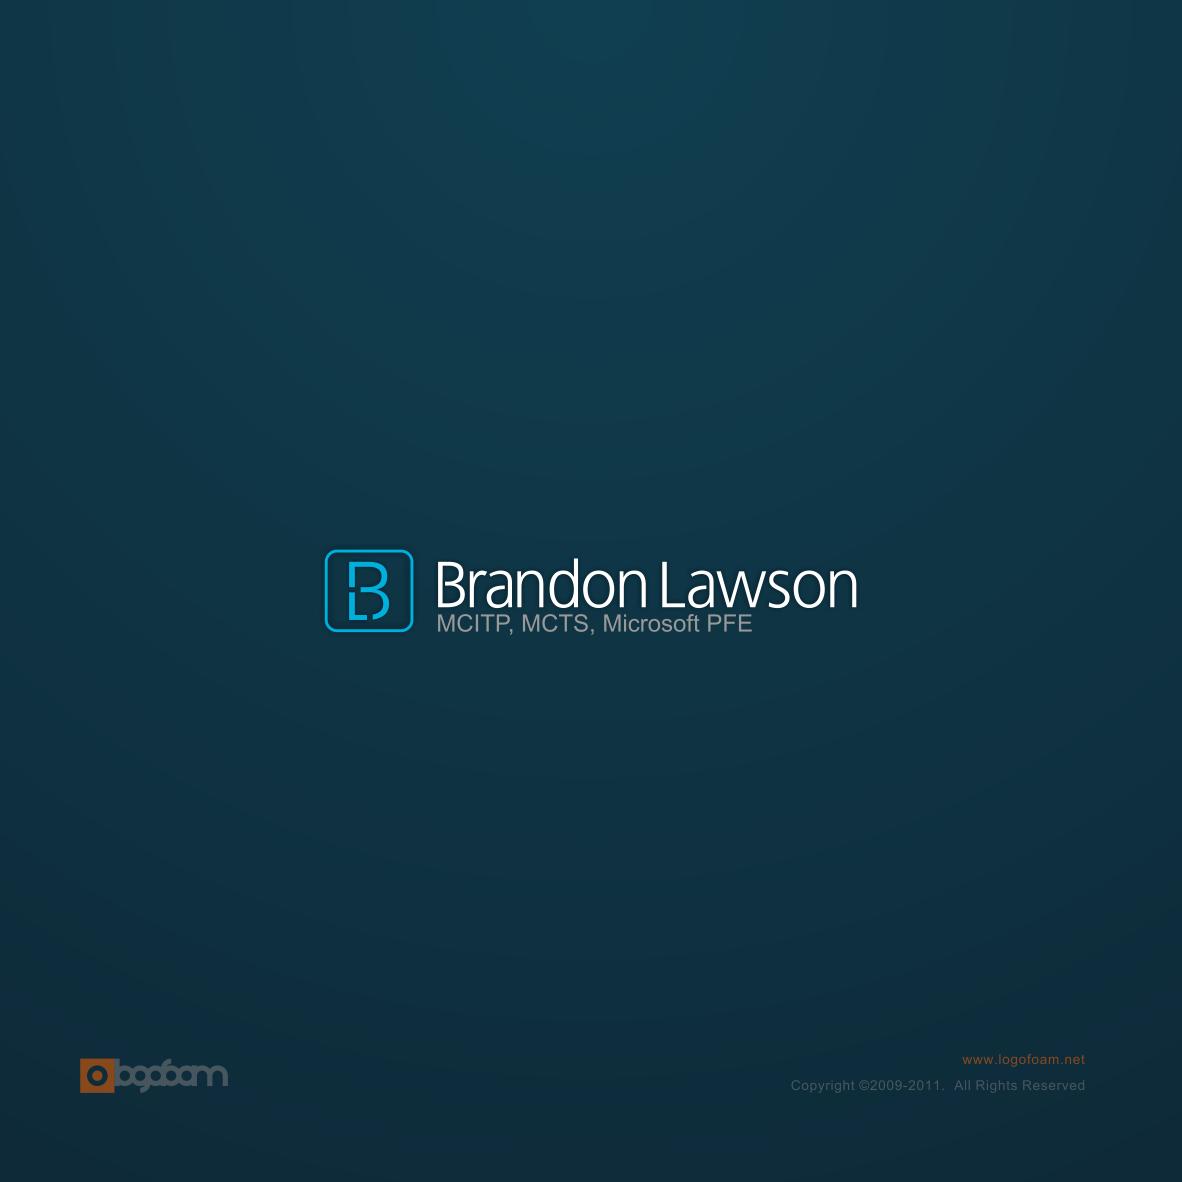 Help Brandon Lawson with a new logo